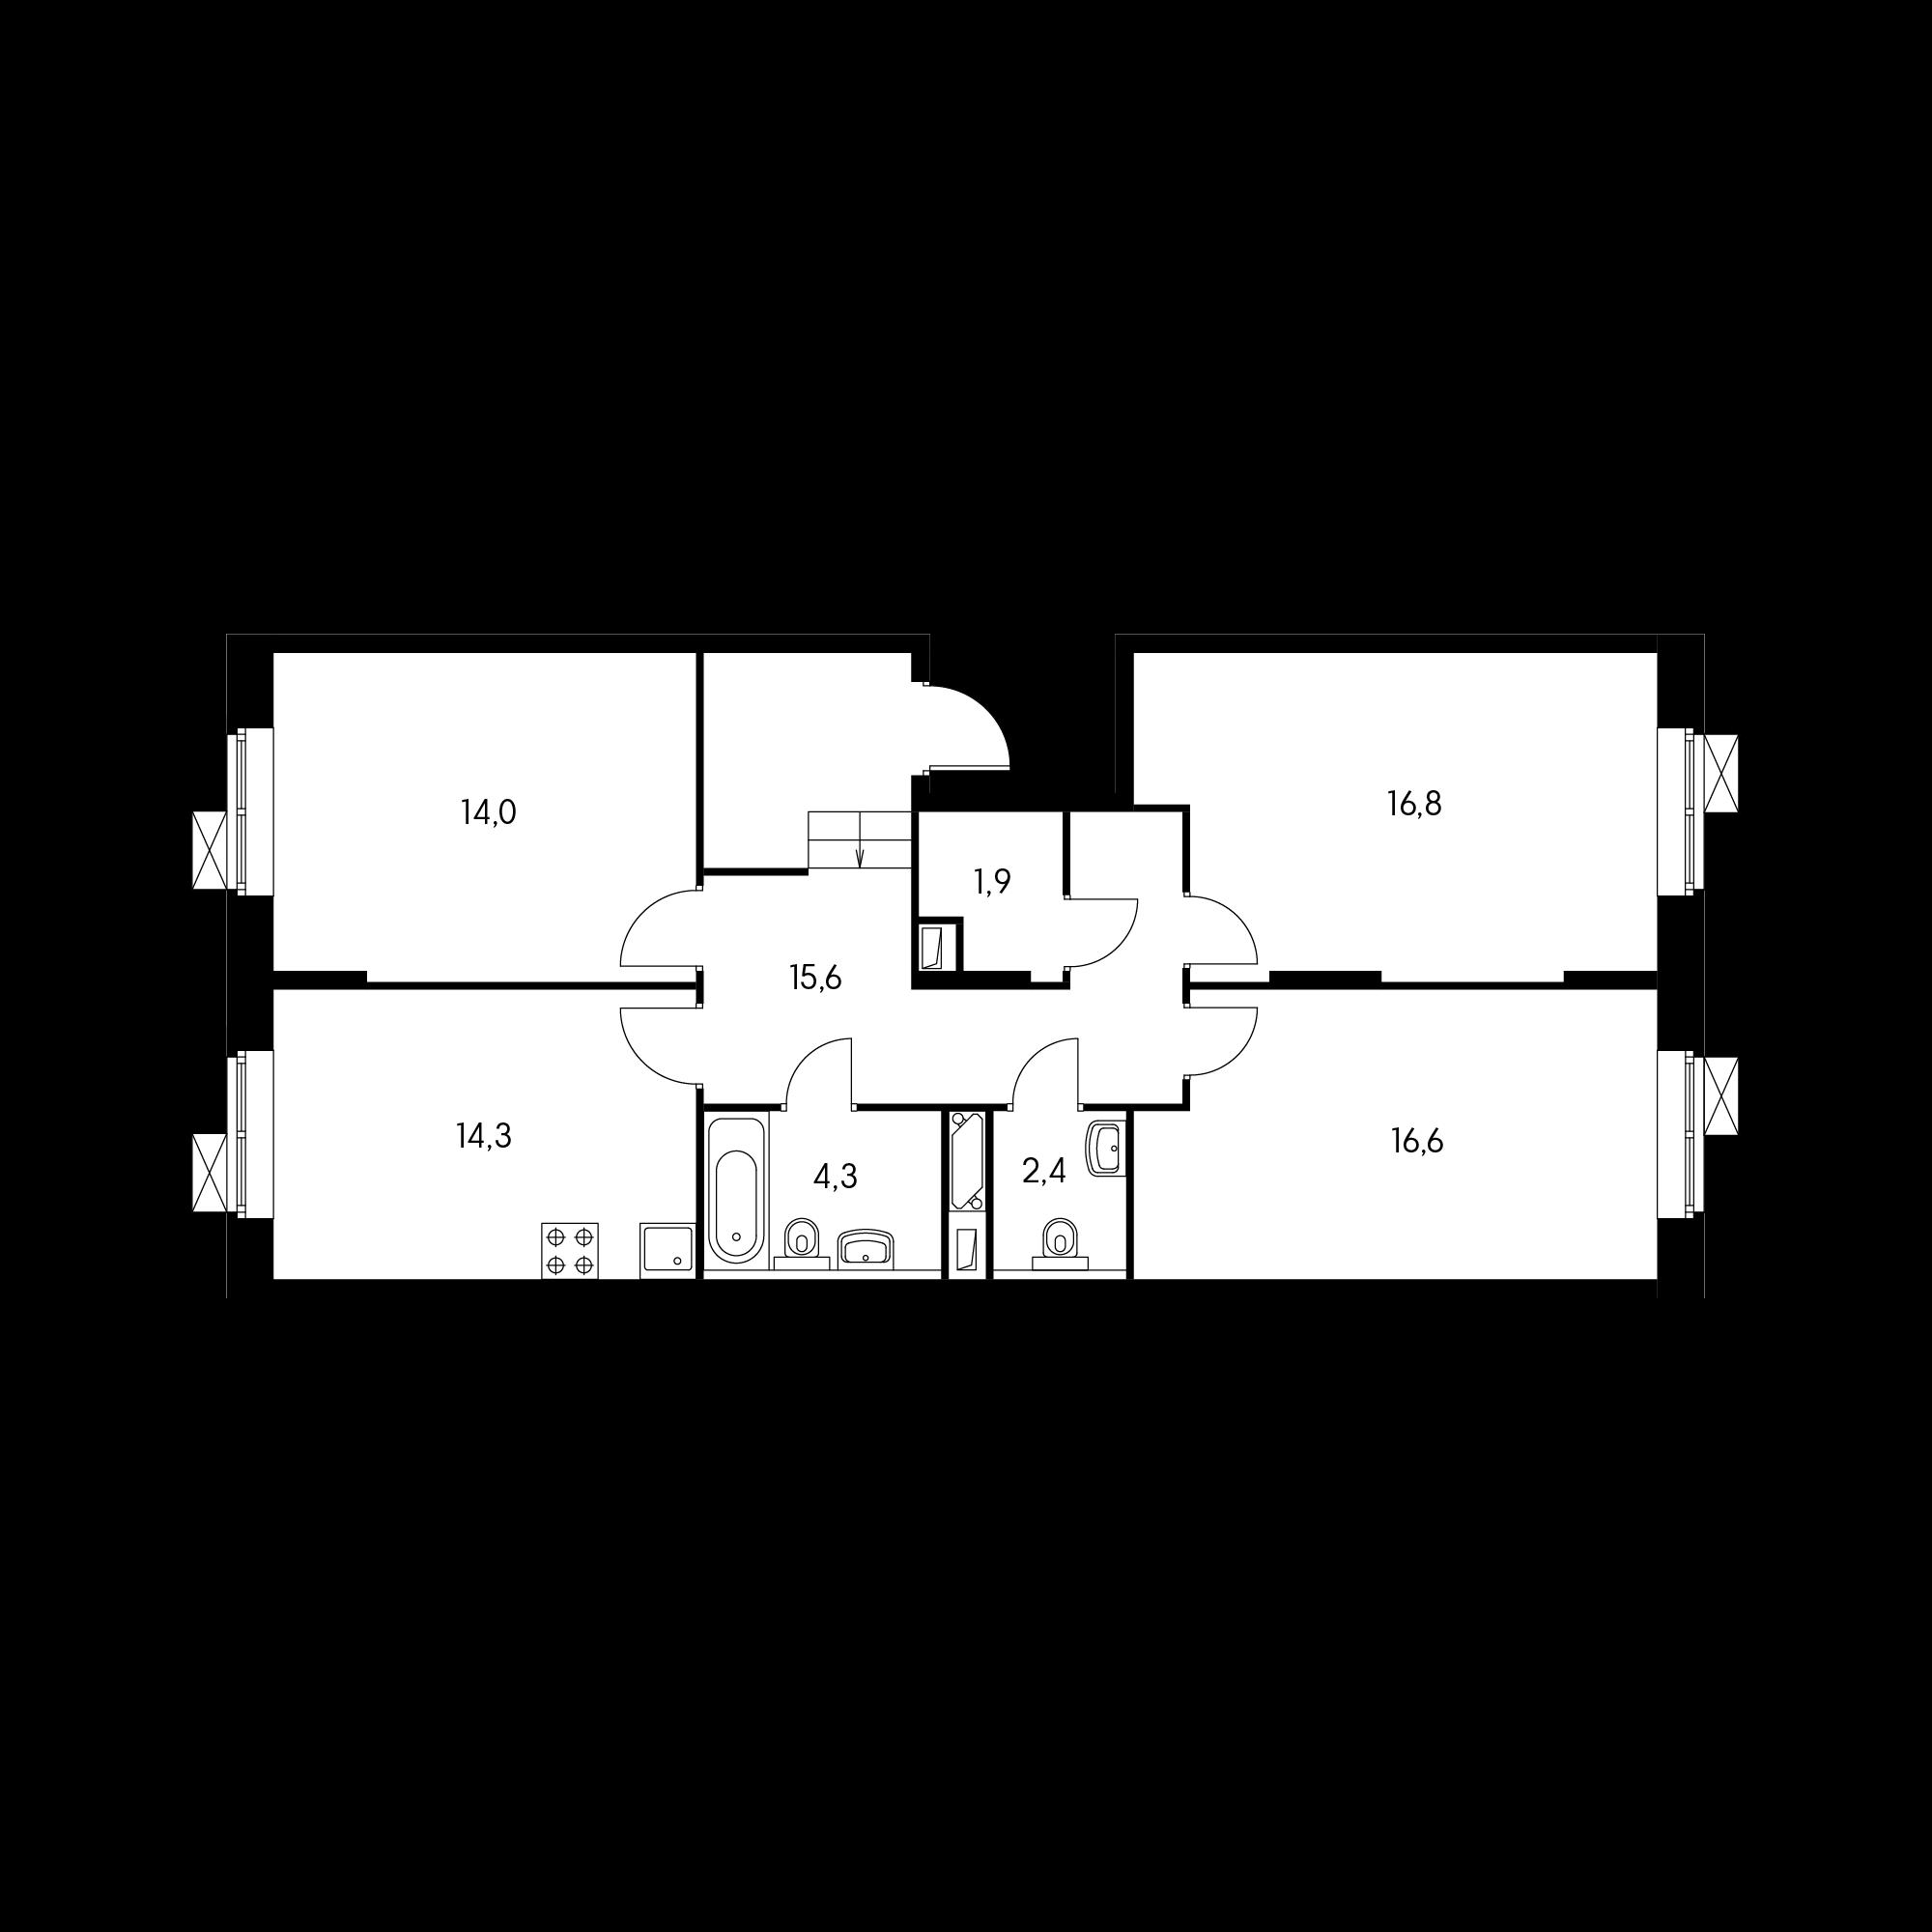 3EL5.04.1